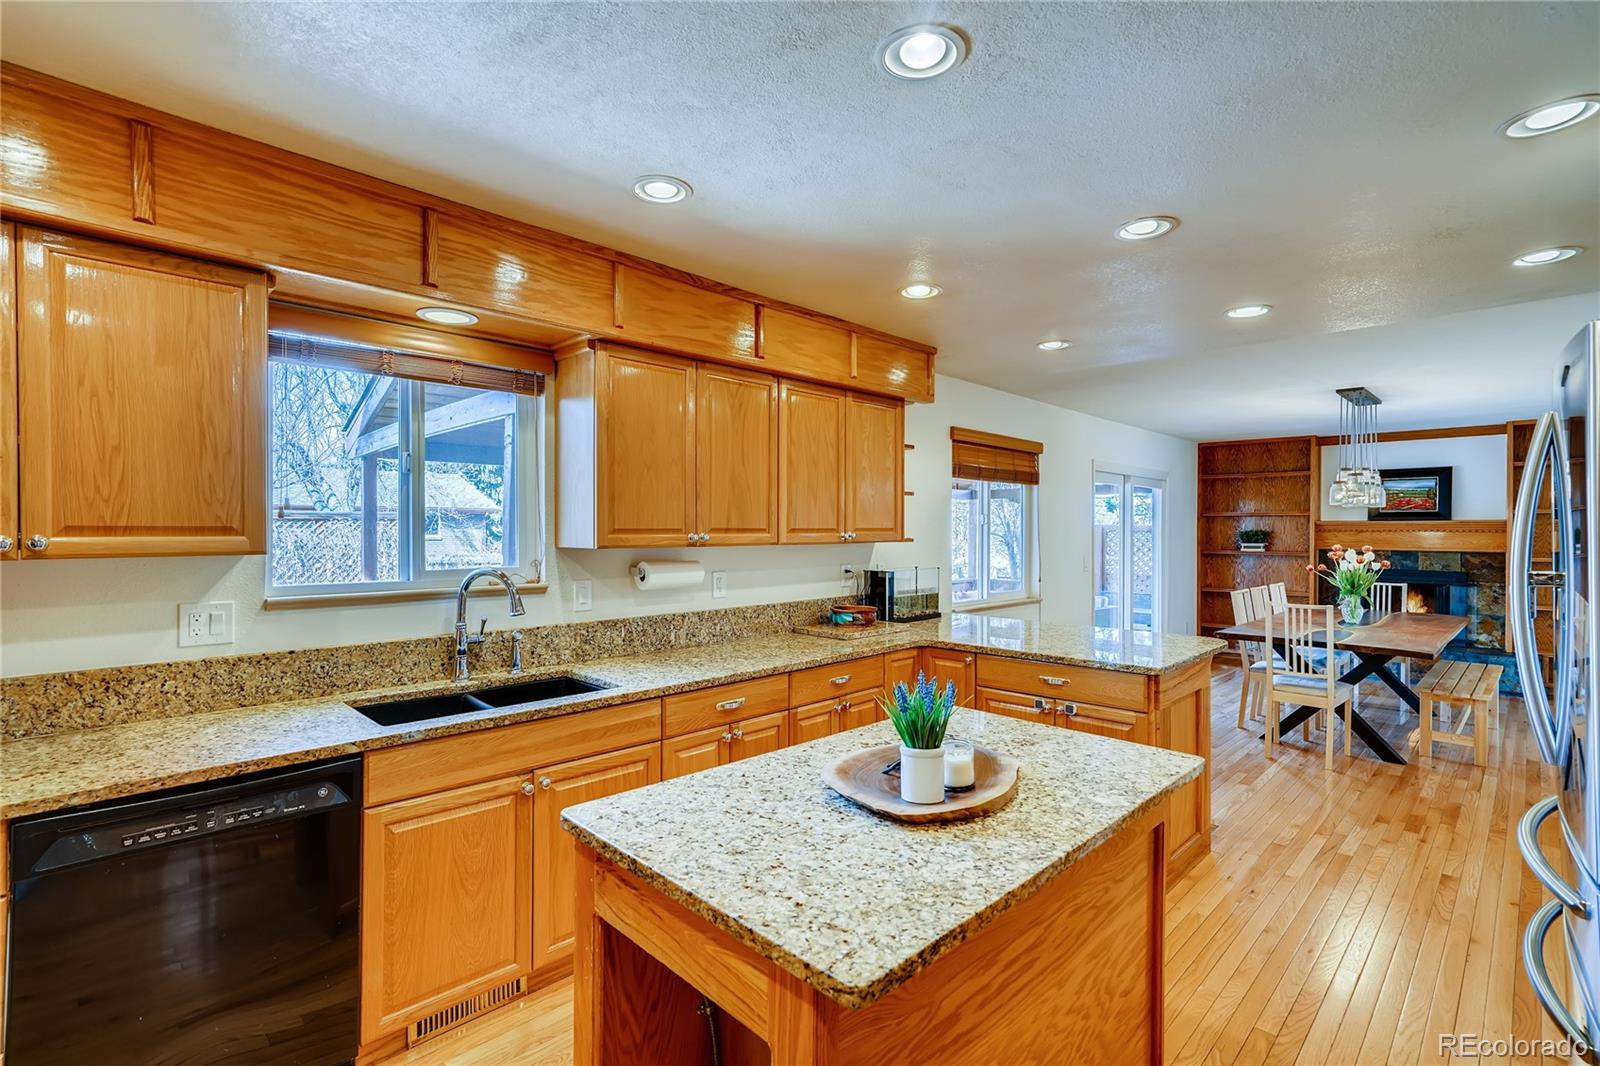 MLS# 9748380 - 9 - 8897 W Woodard Drive, Lakewood, CO 80227